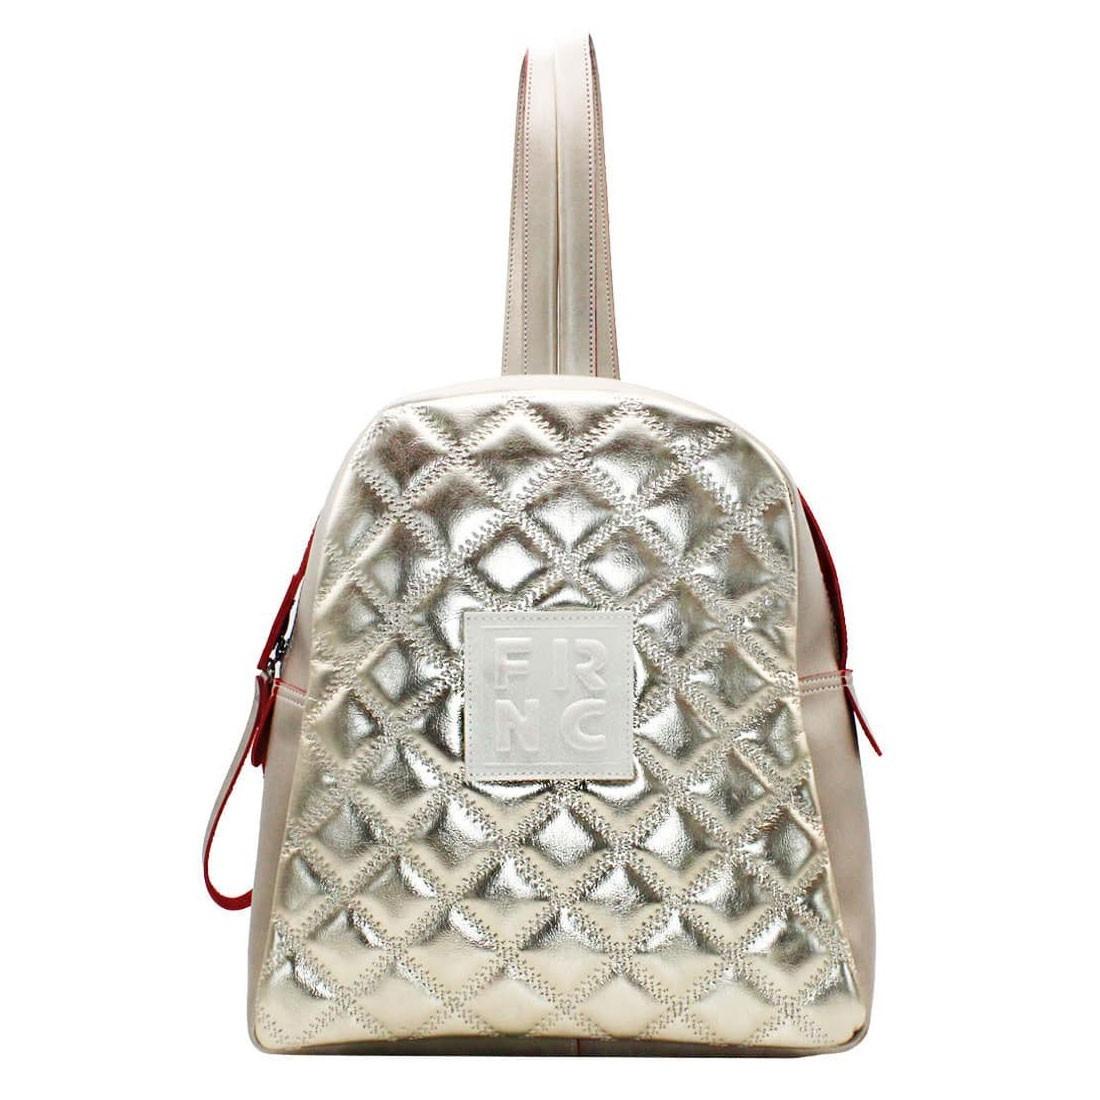 23a27f8efb FRNC FRANCESCO Τσάντα Γυναικεία Πλάτης-Backpack 1202 Πλατίνα ...